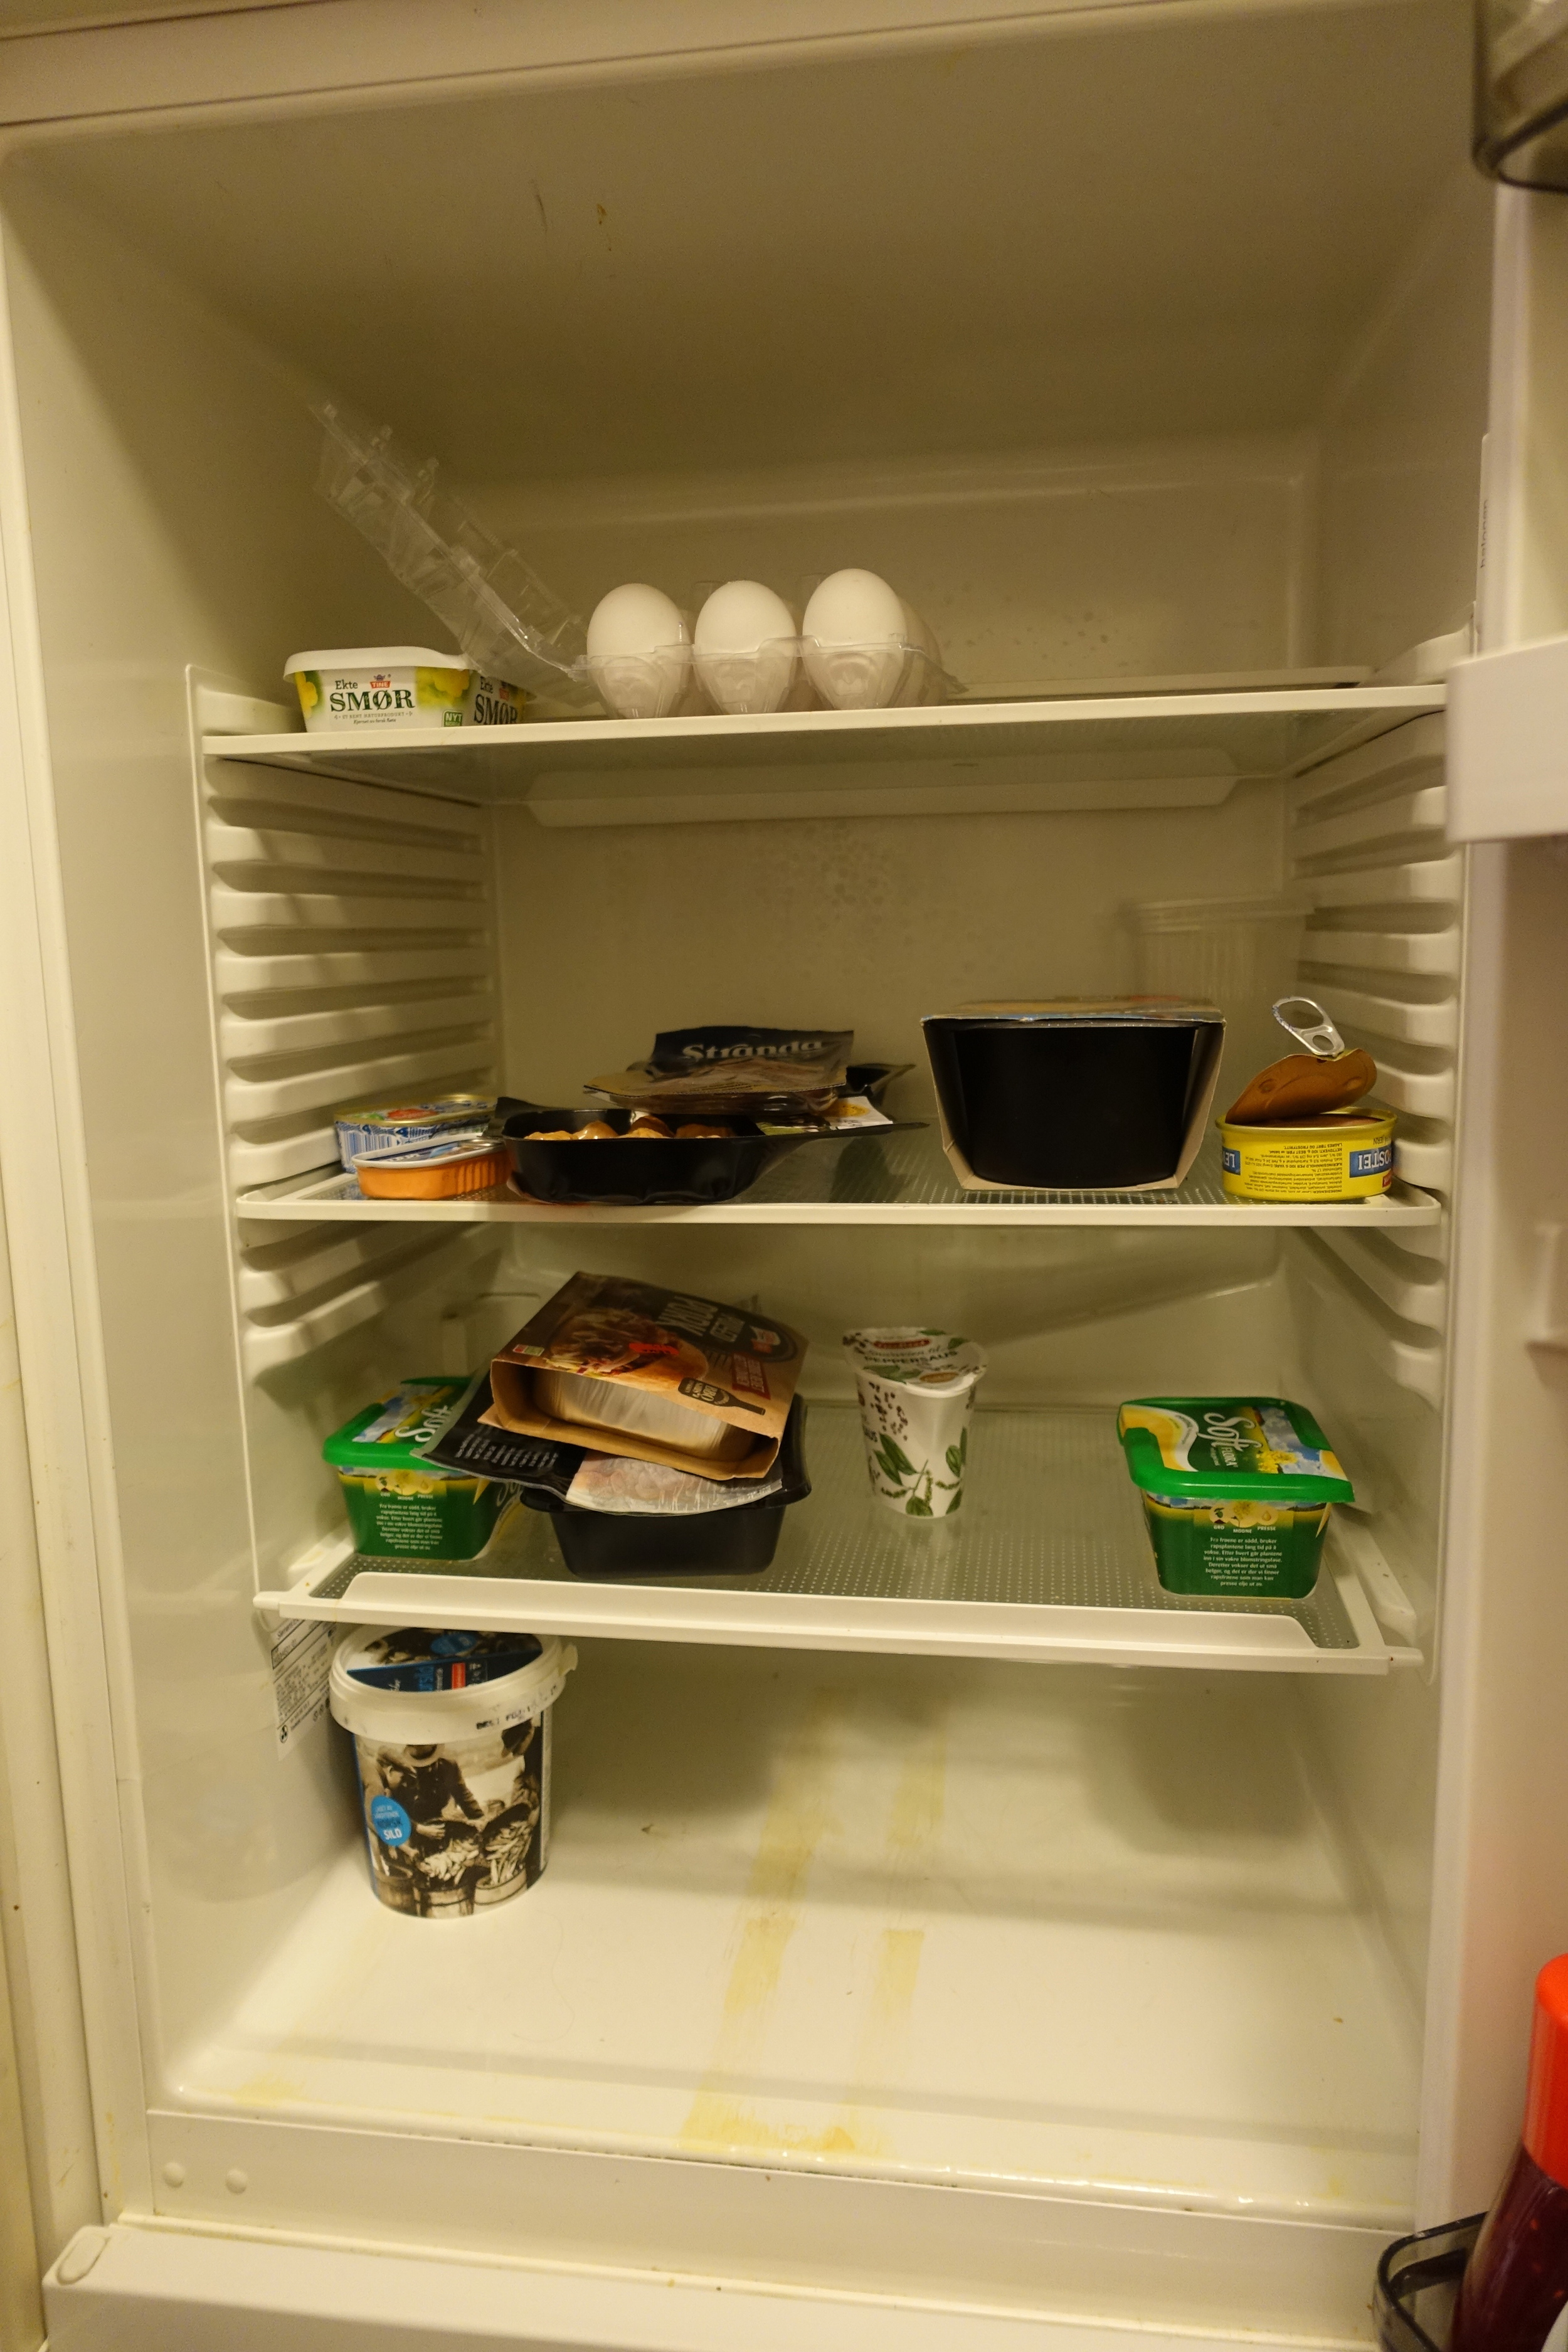 Mills Kaviar IDI4 Stein Ågren kjøleskapet nærbilde.jpg